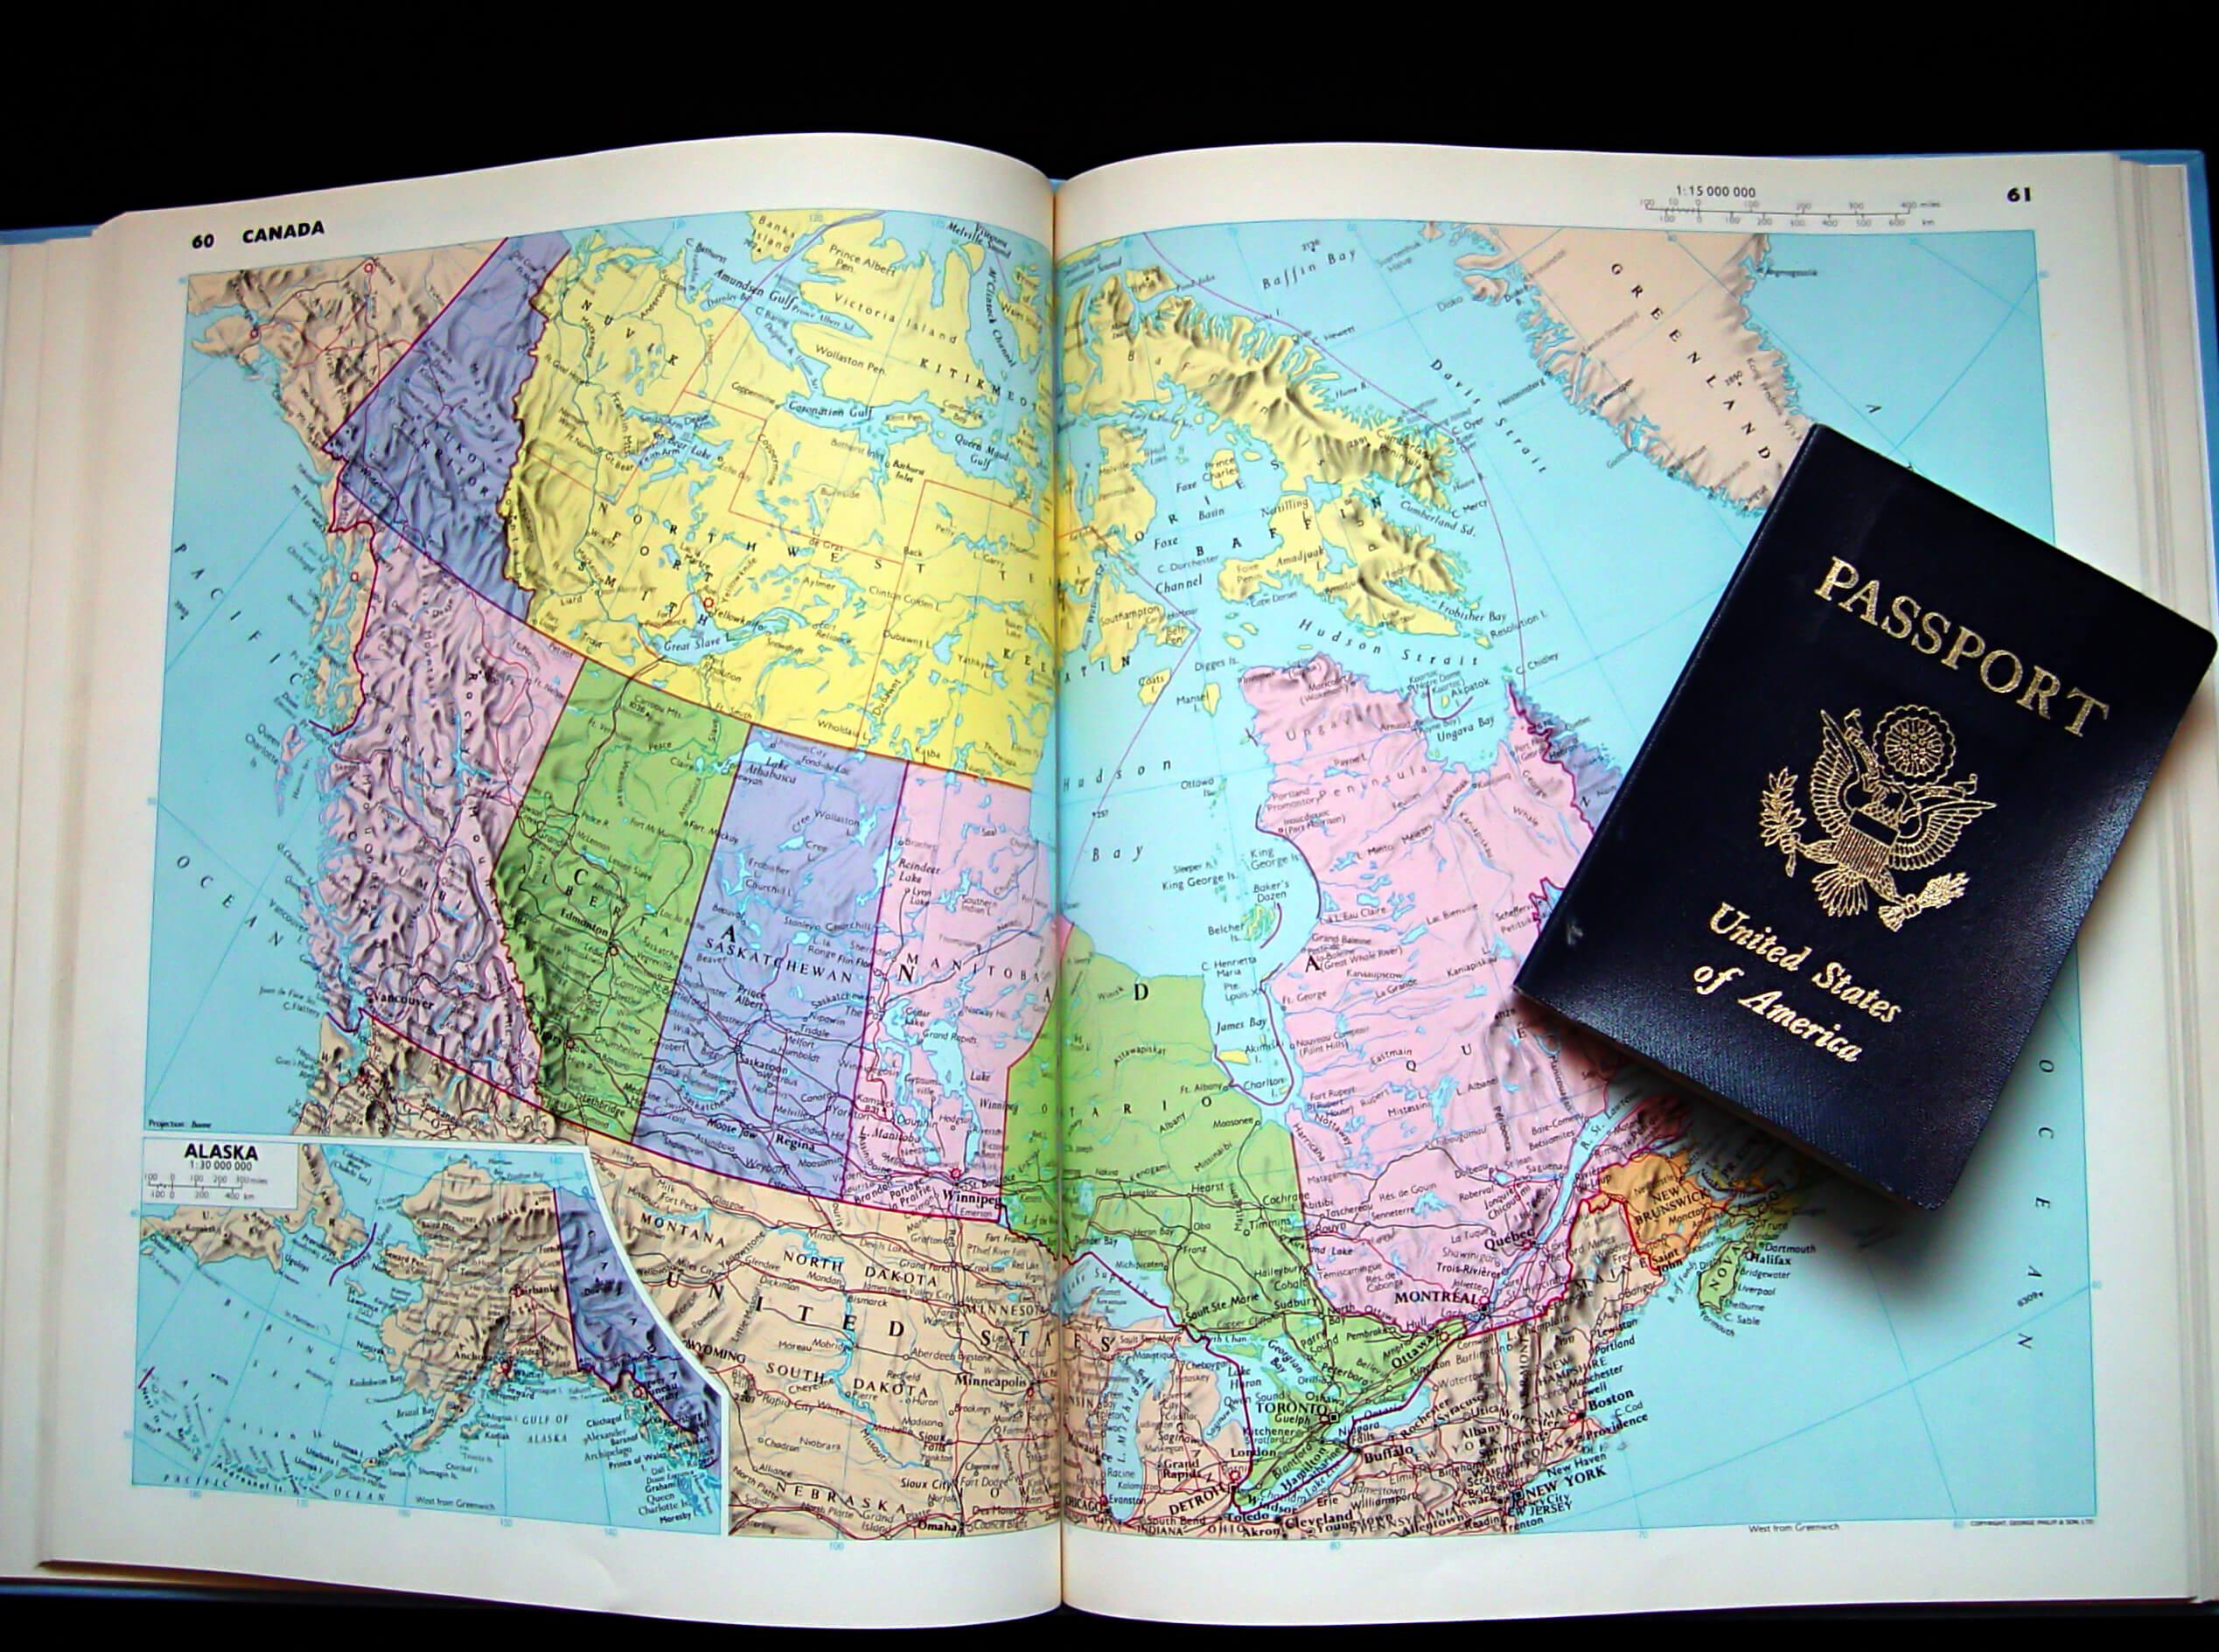 US Passport to Canada